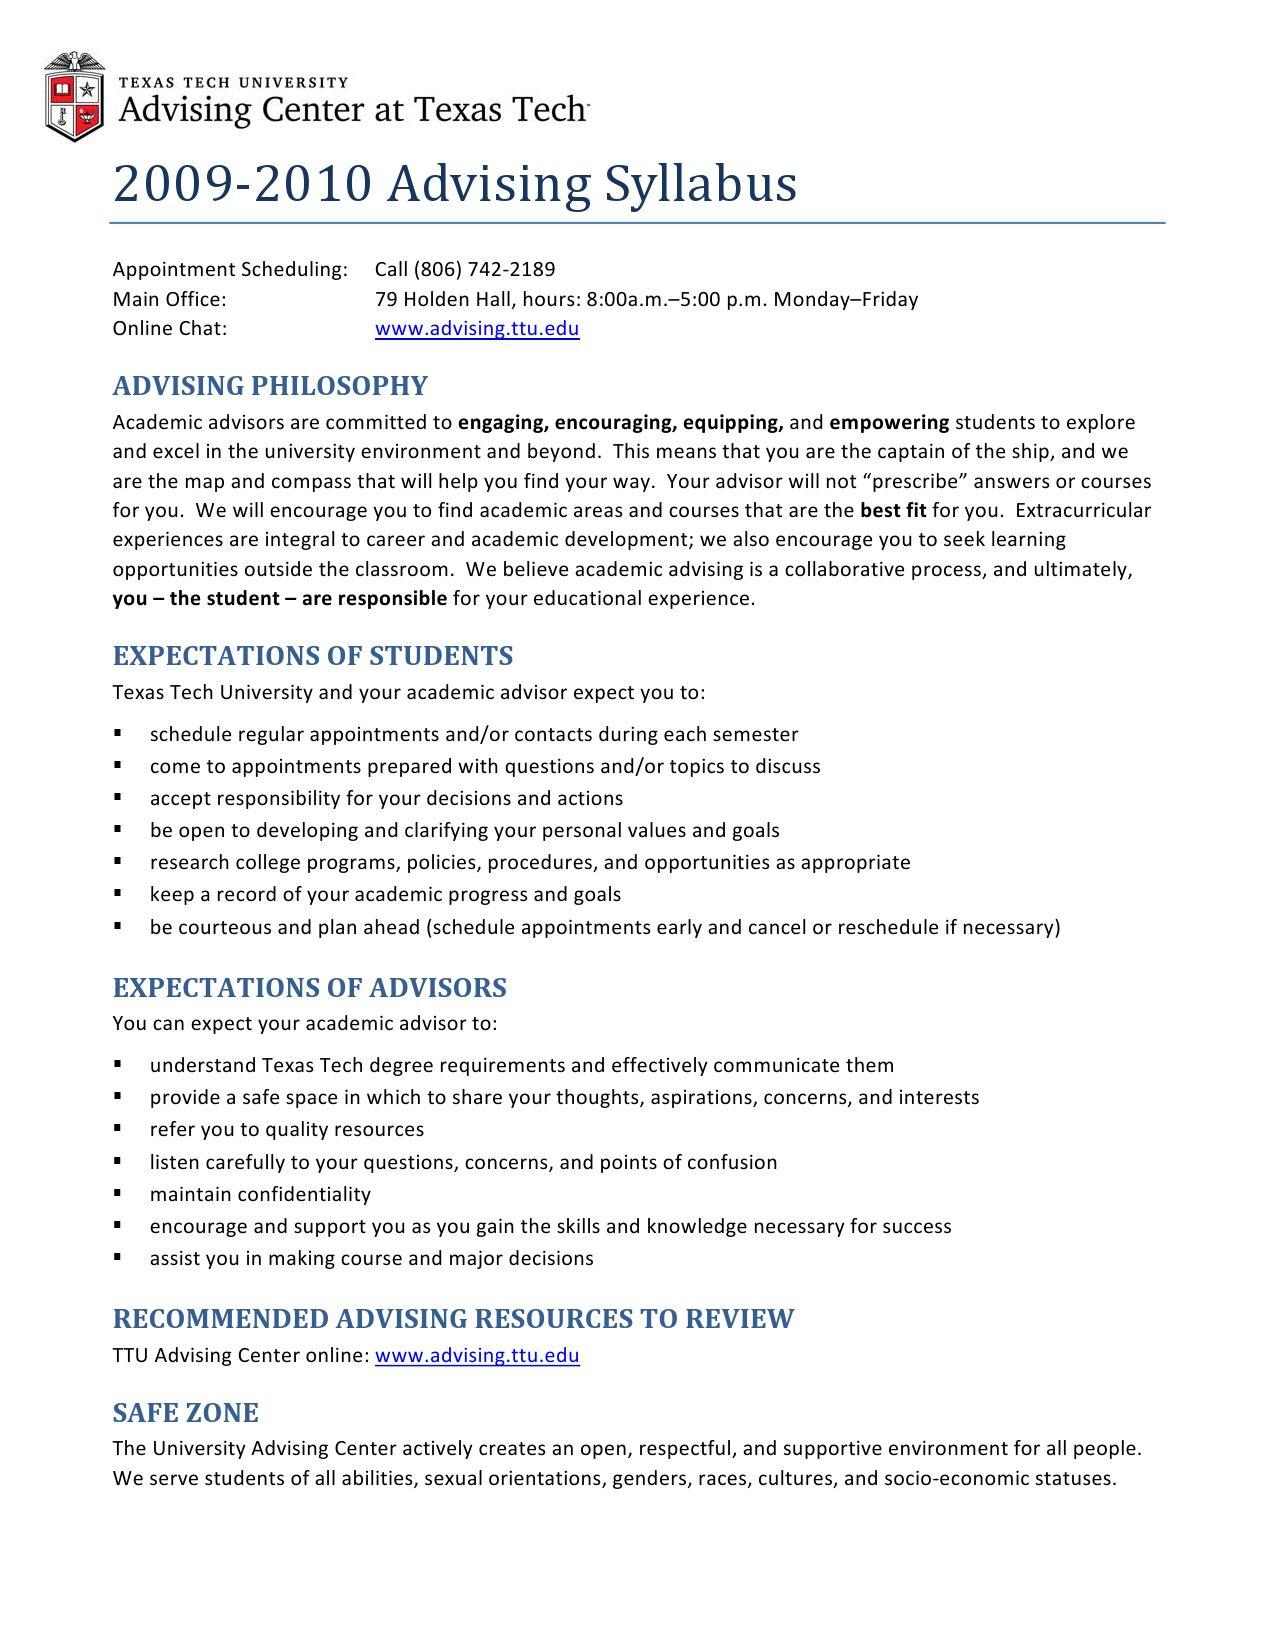 Advising Syllabustexas Tech University Advising - Issuu Throughout Texas Tech University Semester Schedule